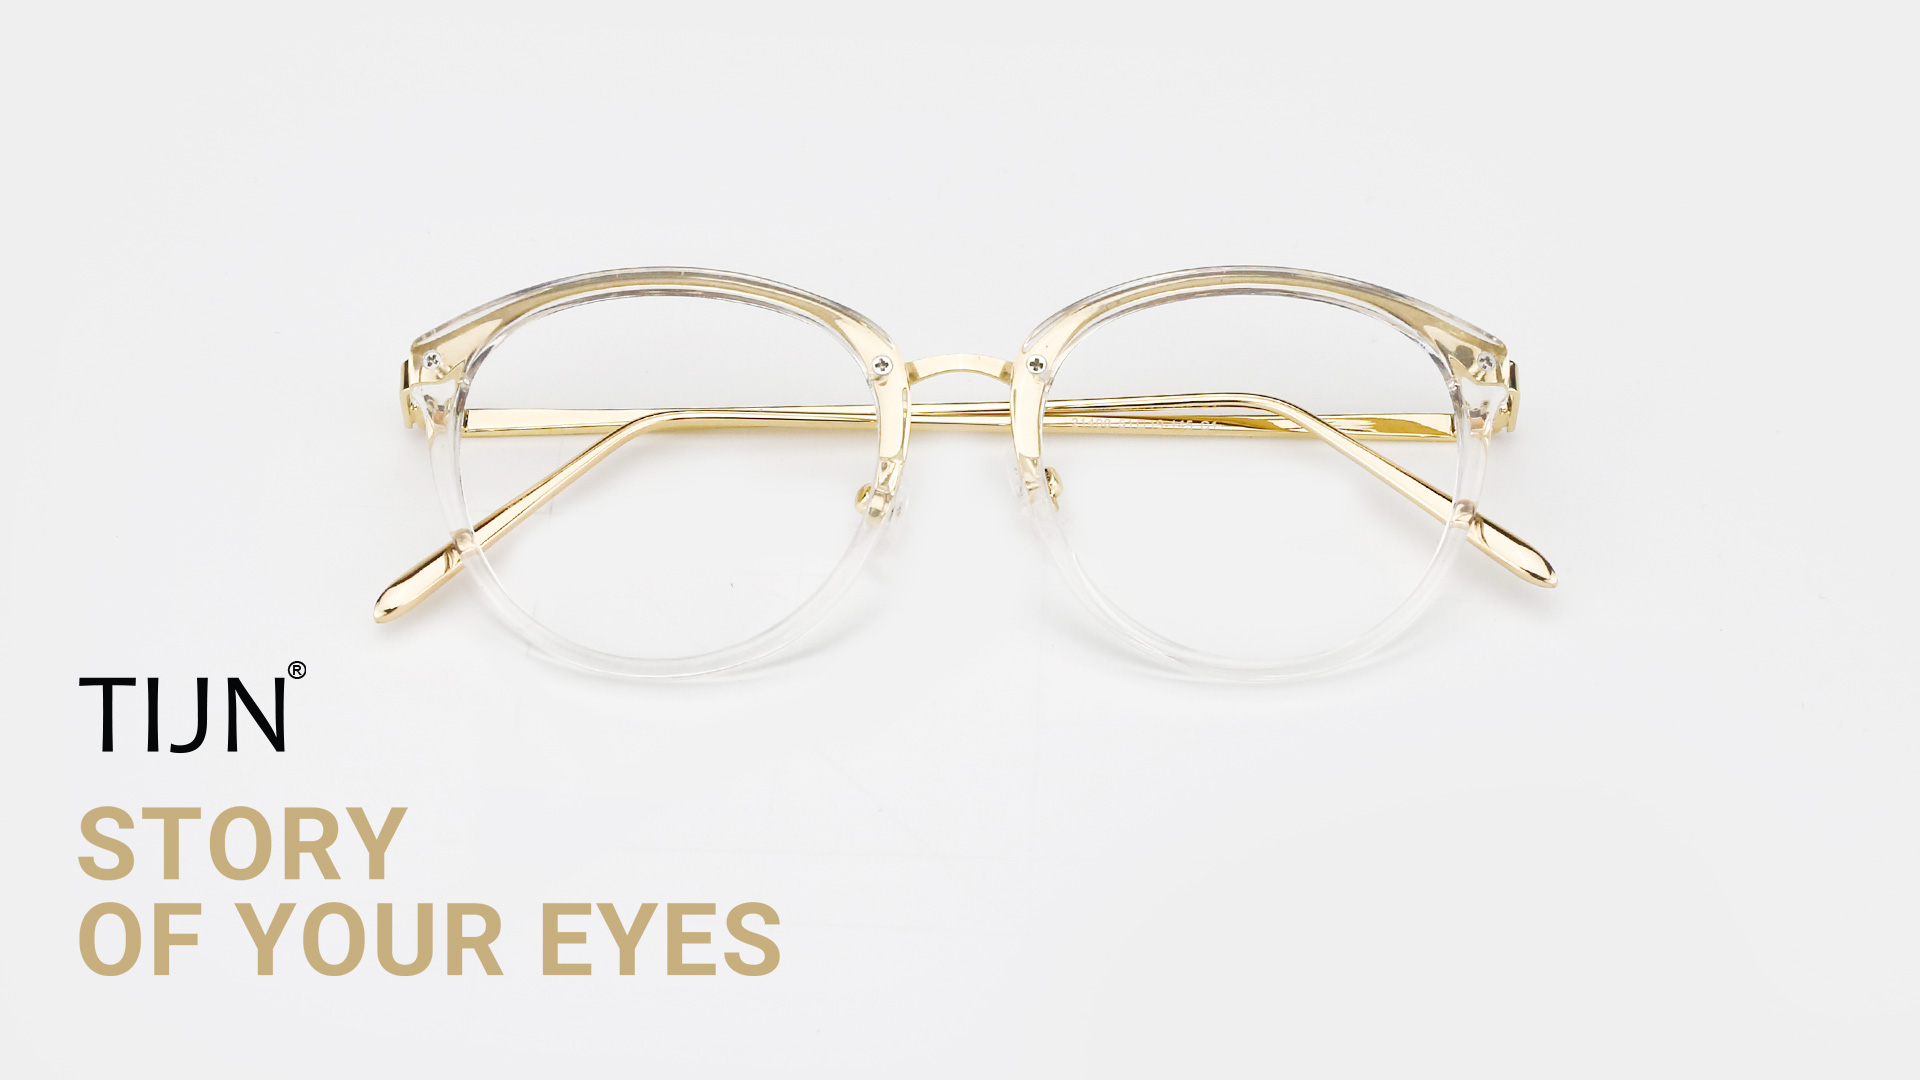 68d5d20c345 TIJN Vintage Round Metal Optical Eyewear Non-prescription Eyeglasses ...